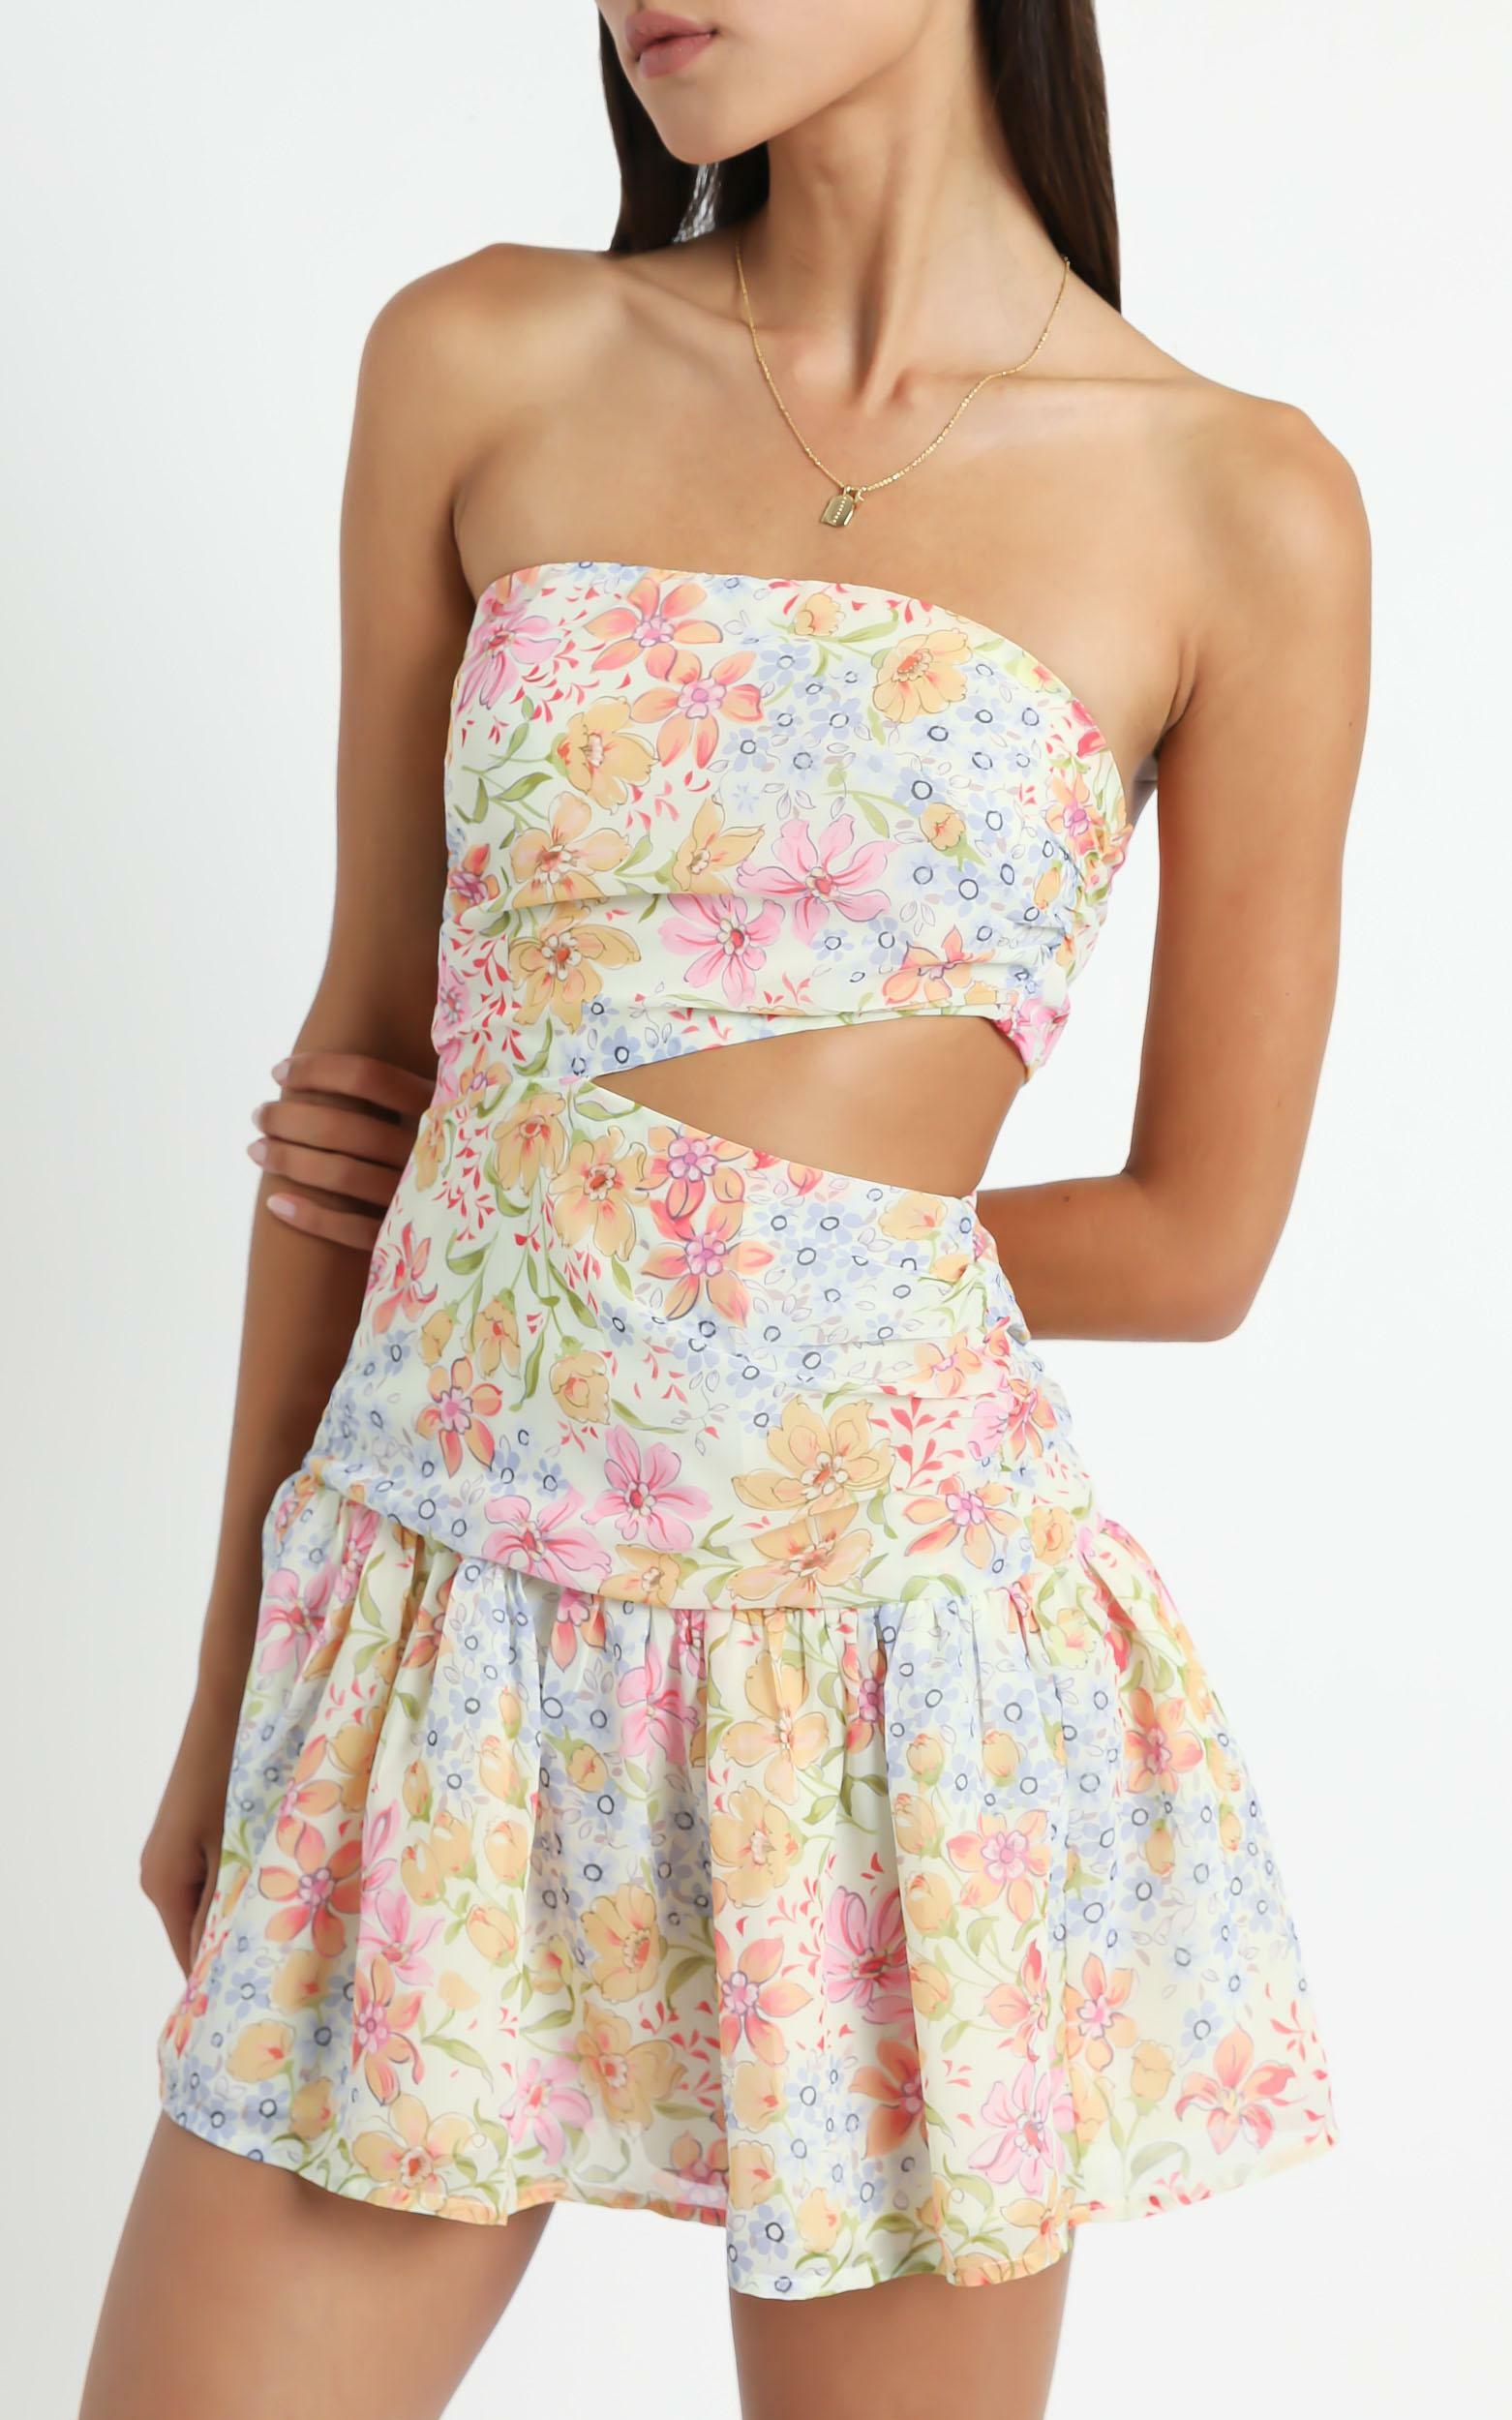 Sazerac Dress in Multi Floral - 06, MLT1, hi-res image number null